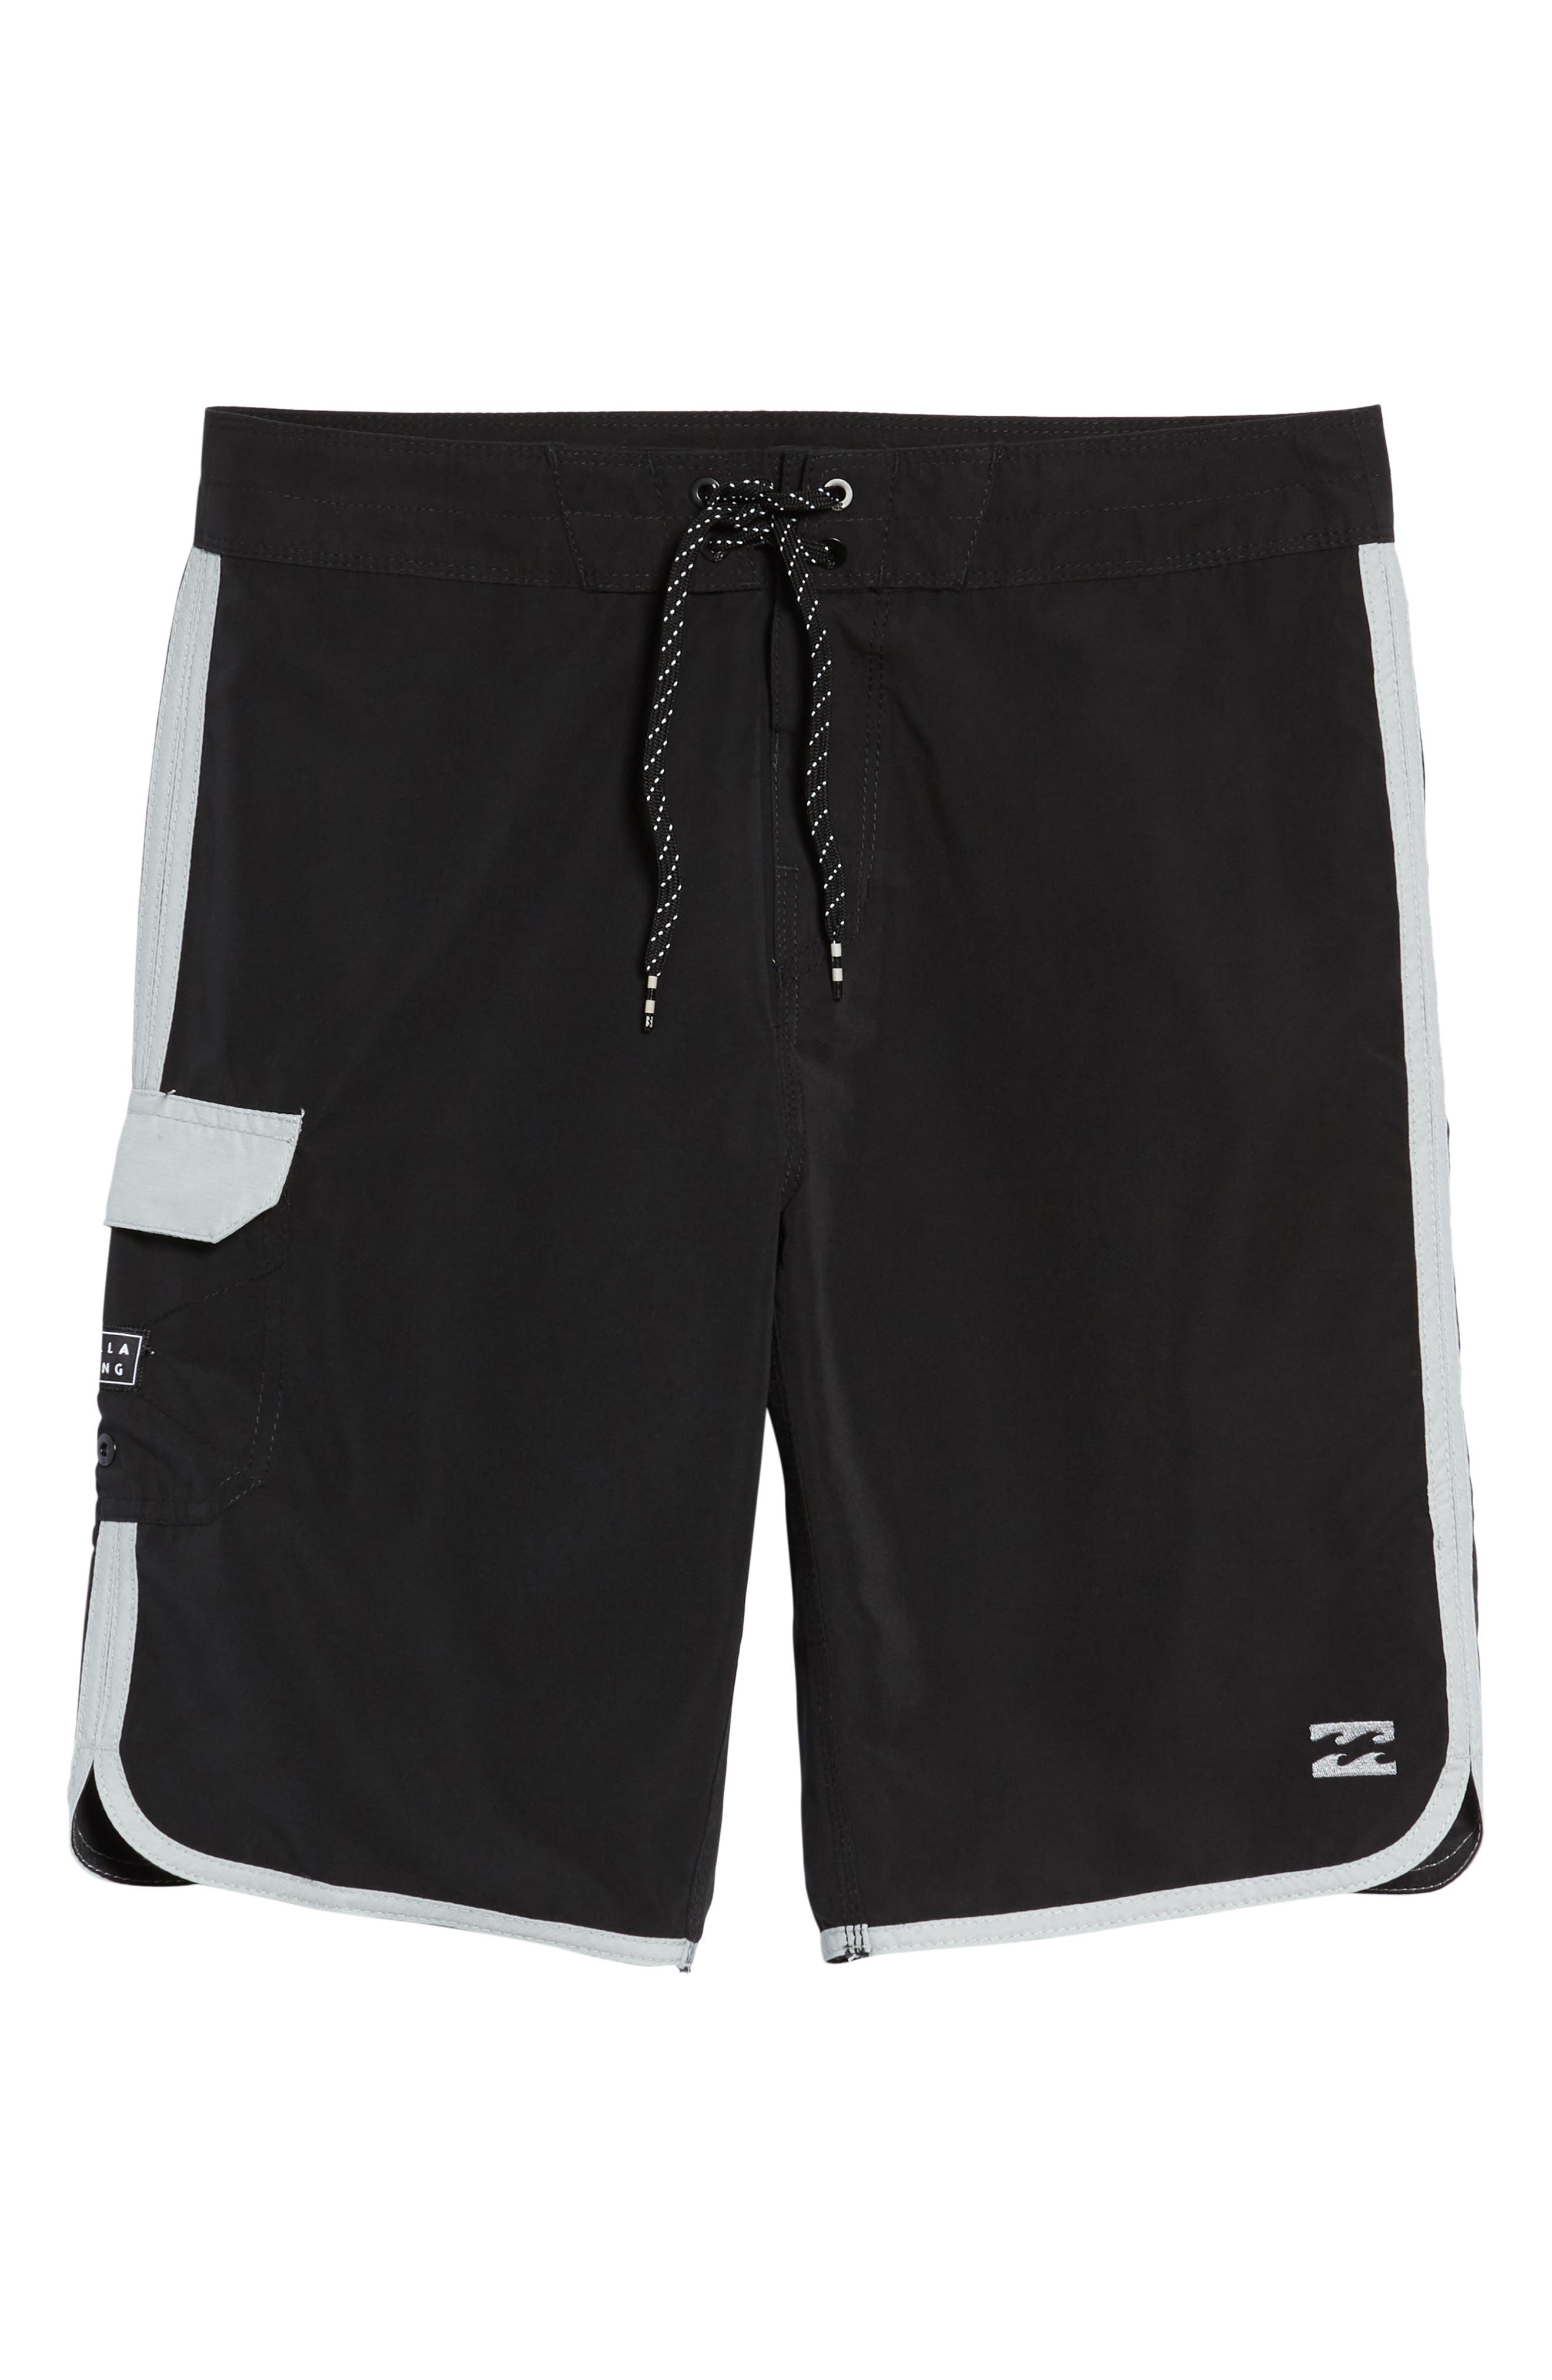 73 OG Board Shorts,                             Alternate thumbnail 6, color,                             Black